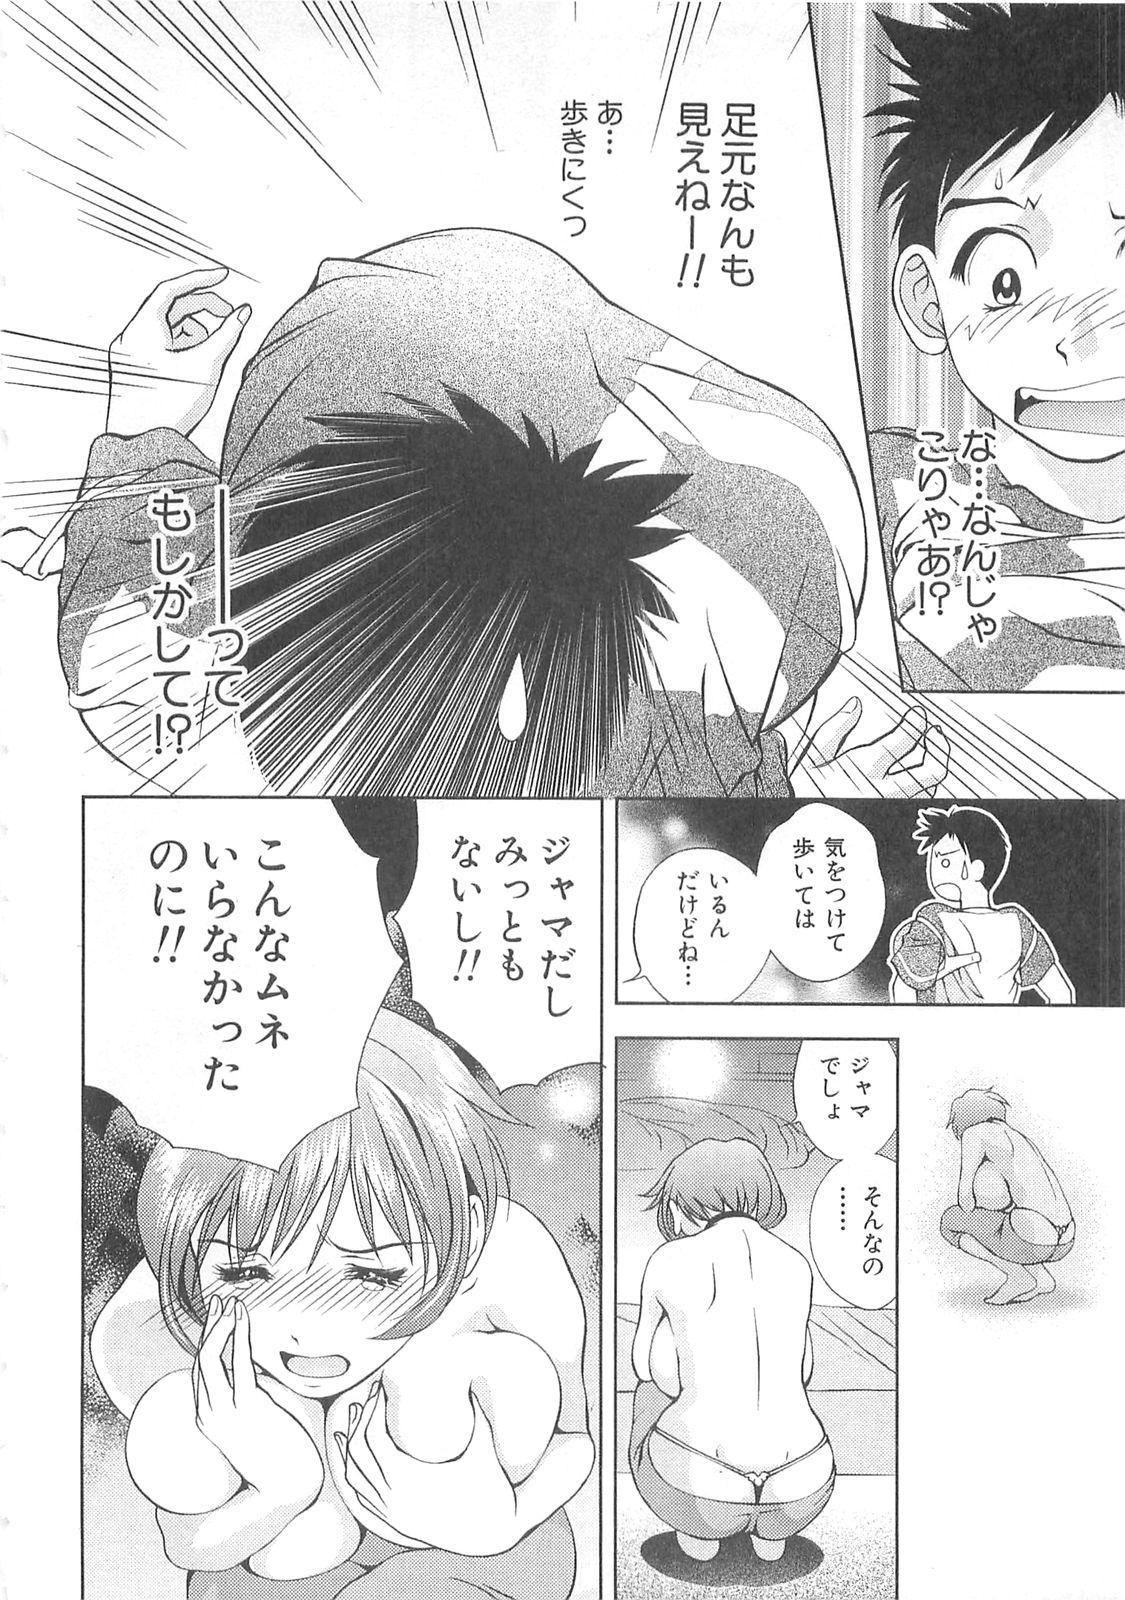 Tenshi no Kyuu - Angel's Pretty Hip 72